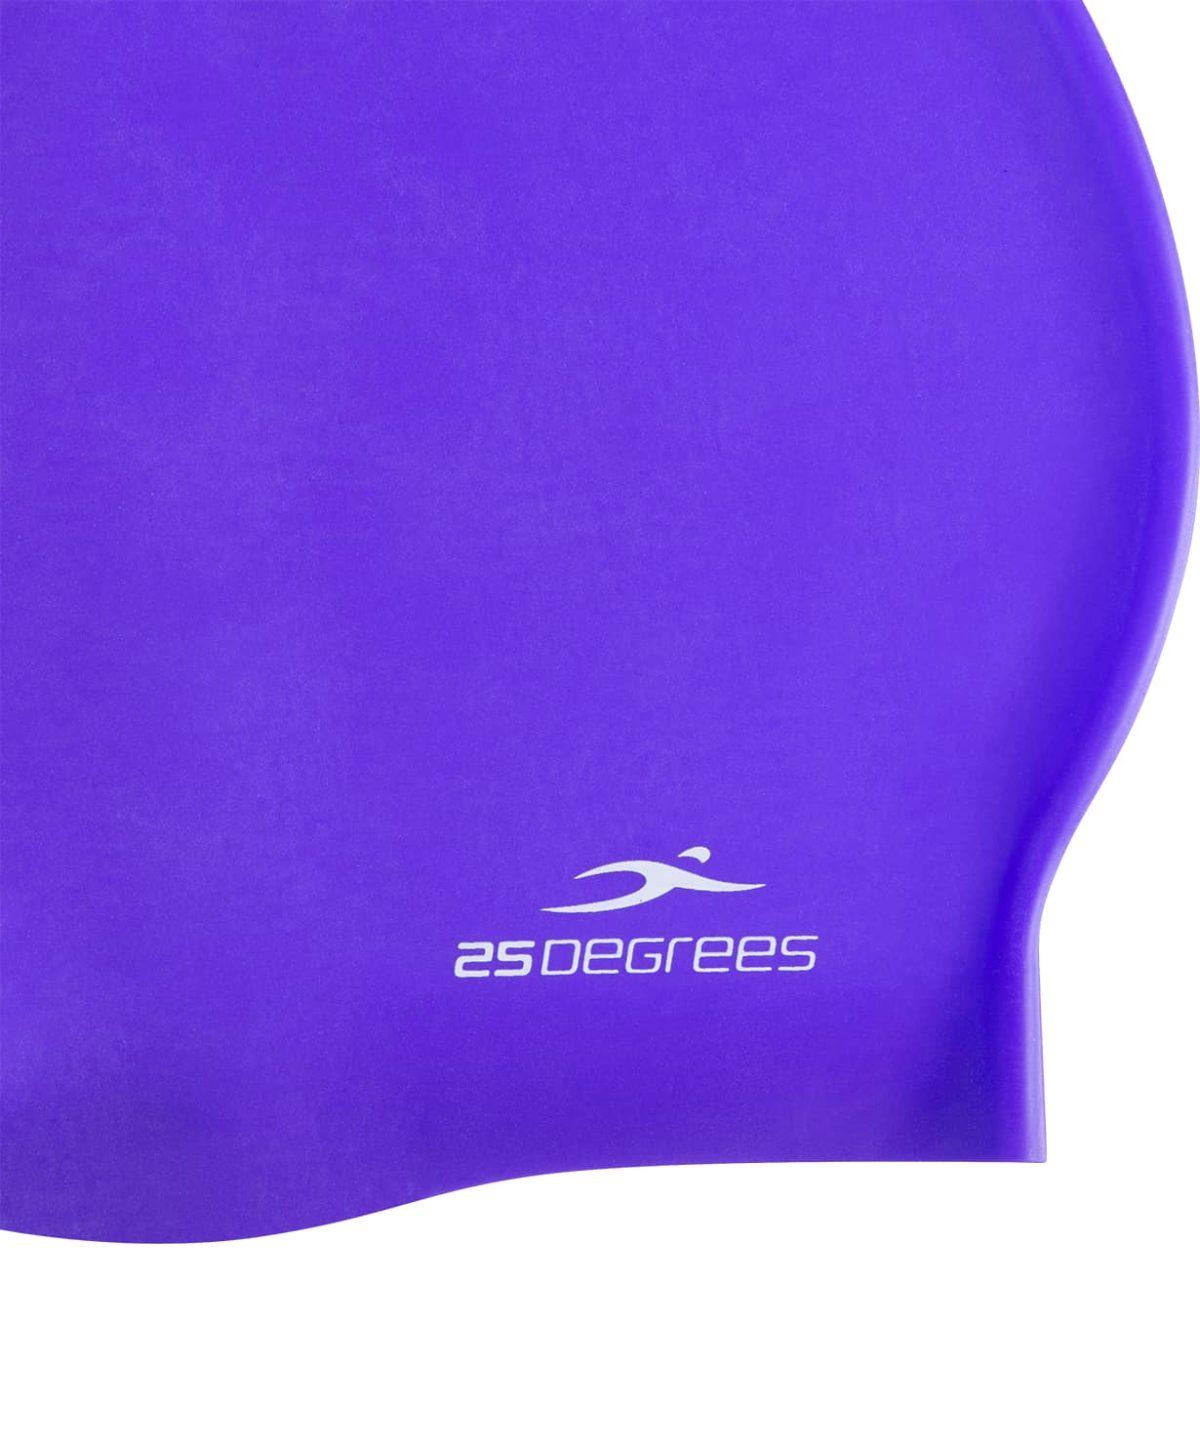 25DEGREES Шапочка для плавания Nuance, силикон  25D21004A: фиолетовый - 3